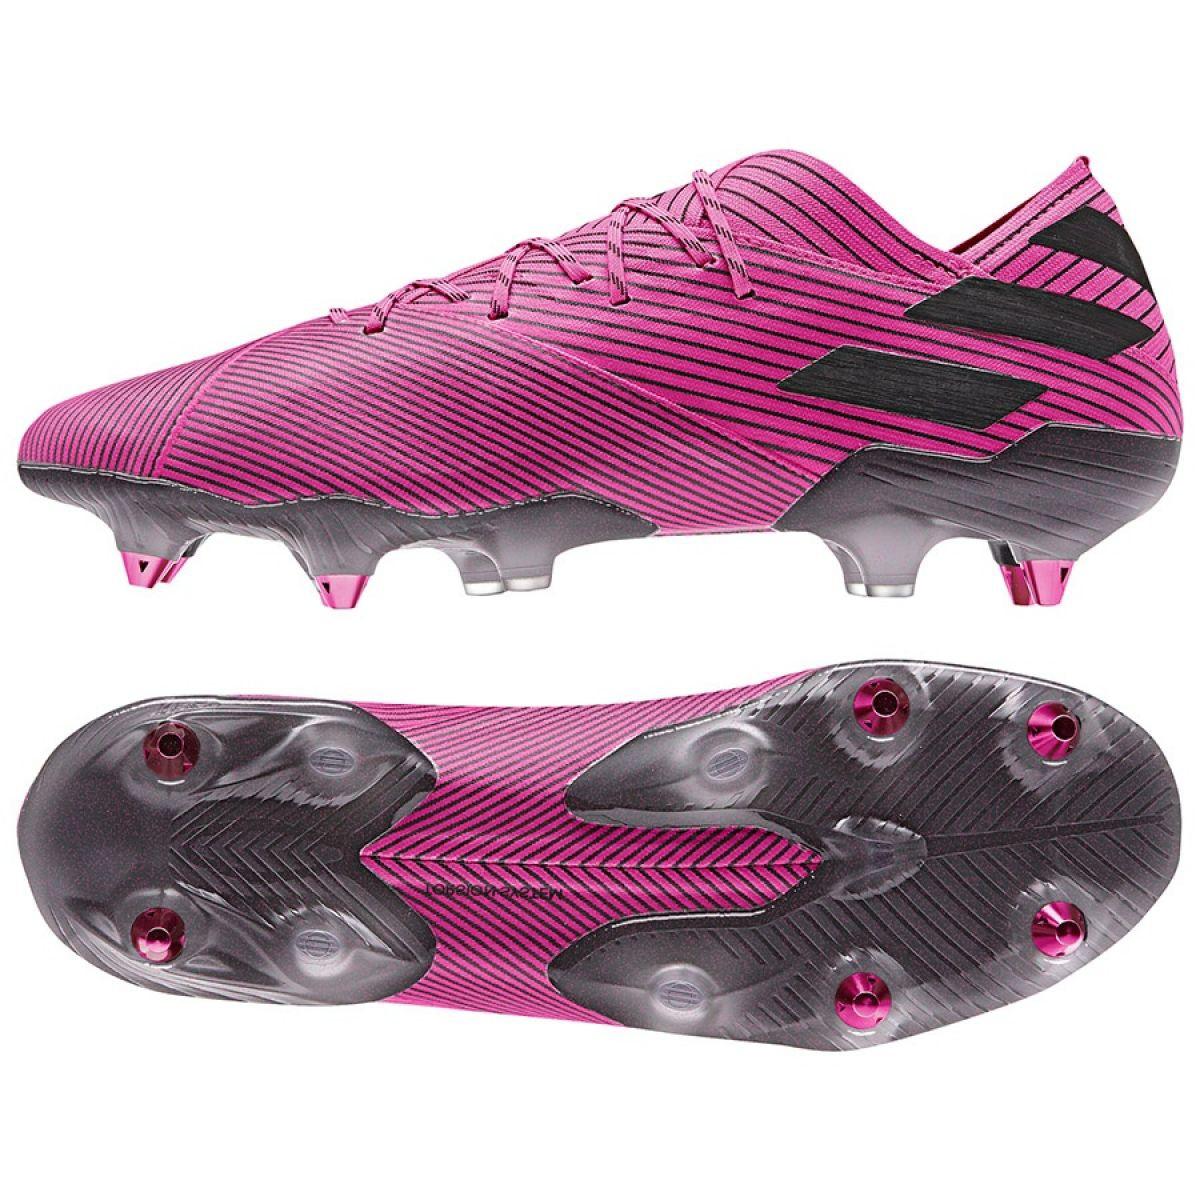 Da M Adidas 19 Scarpe Nemeziz F99838 Calcio Sg 1 bv6yIYgf7